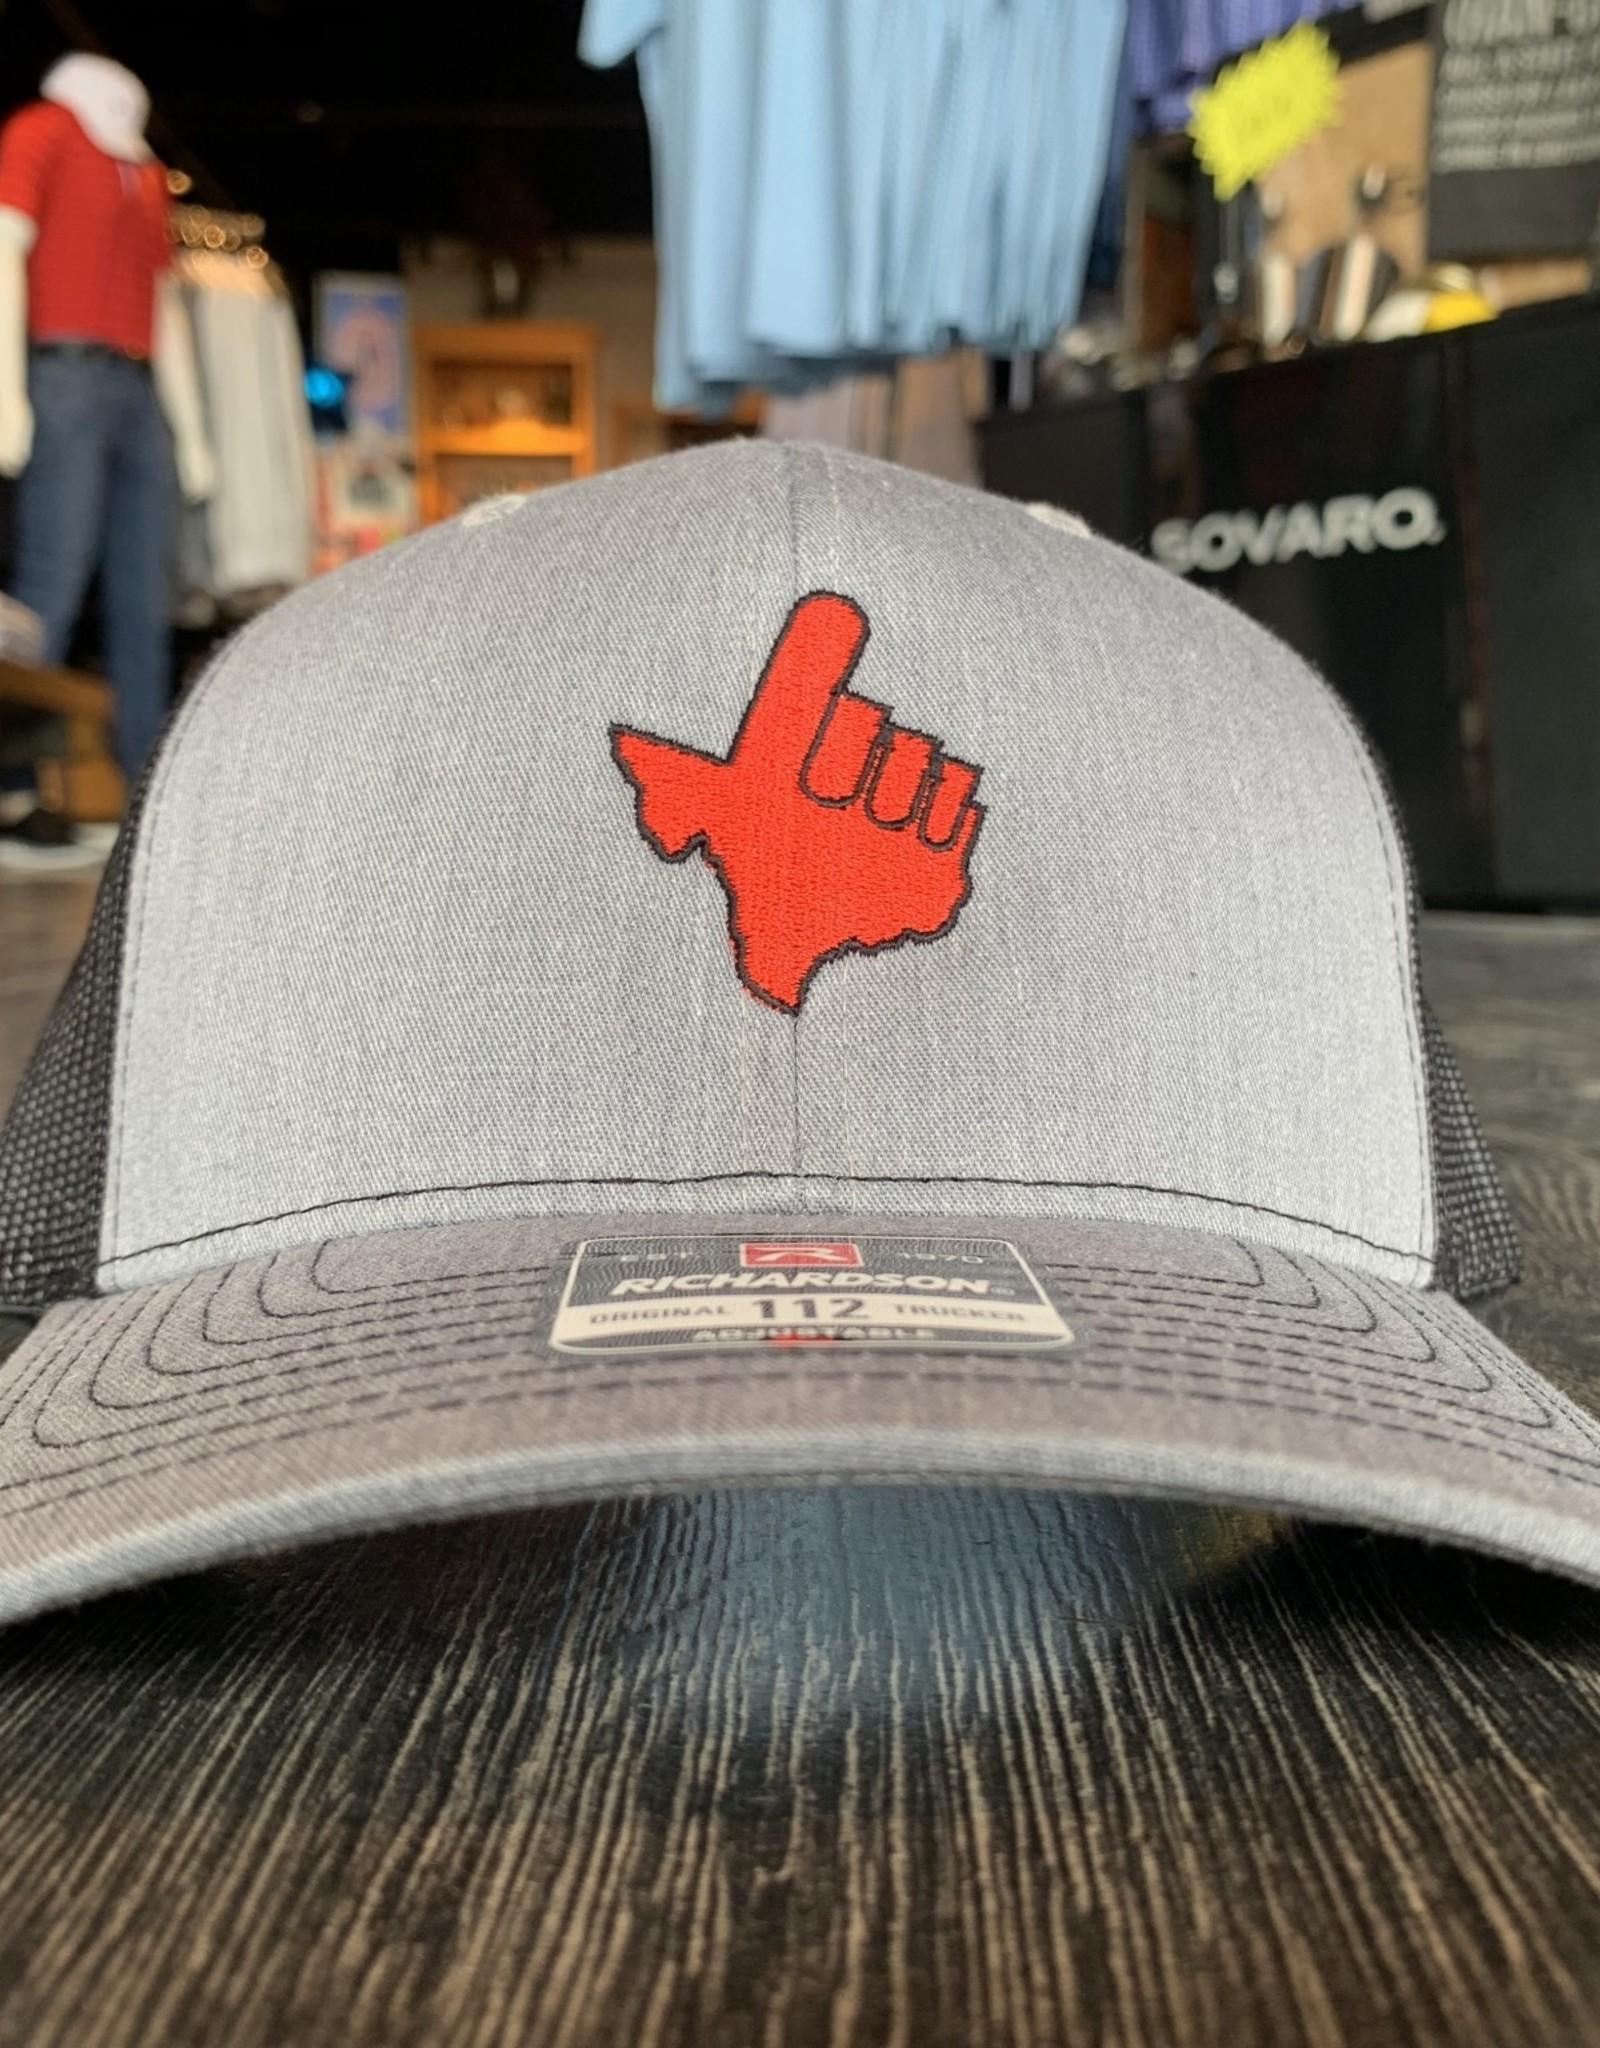 Stag GameDay Richardson 112 Grey/Black Texas Hand